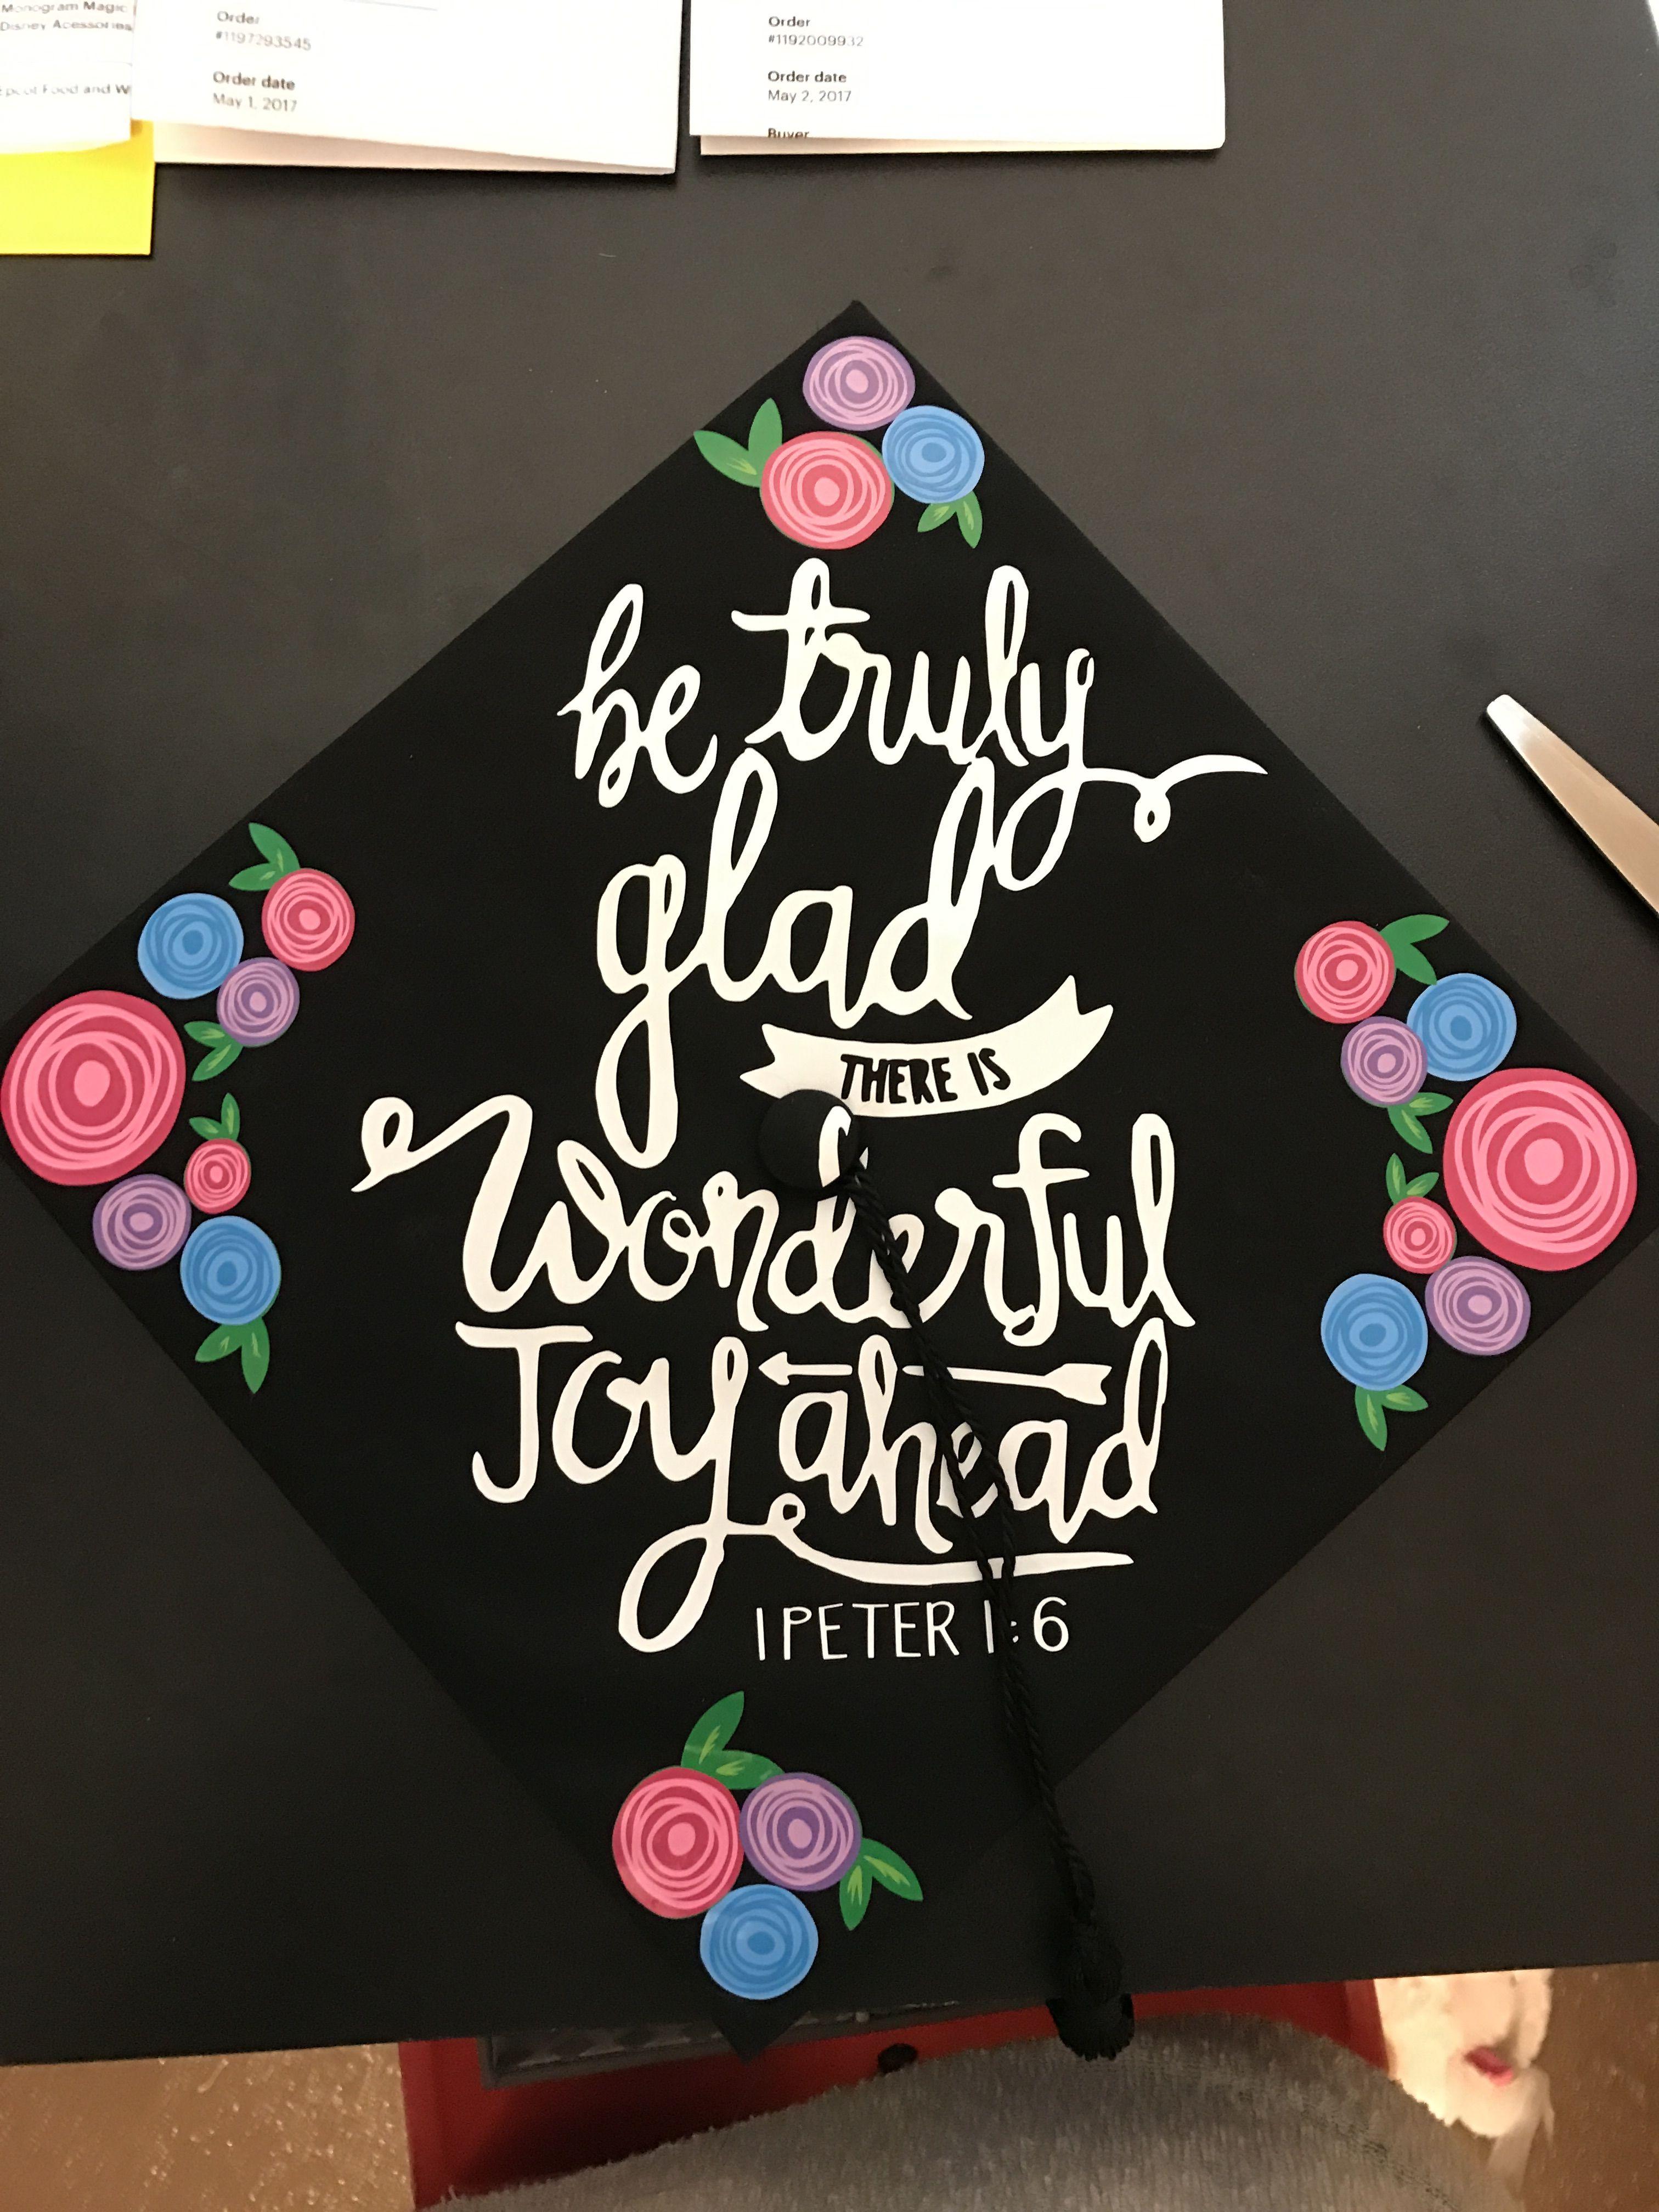 Medium Of Bible Verses For Graduates